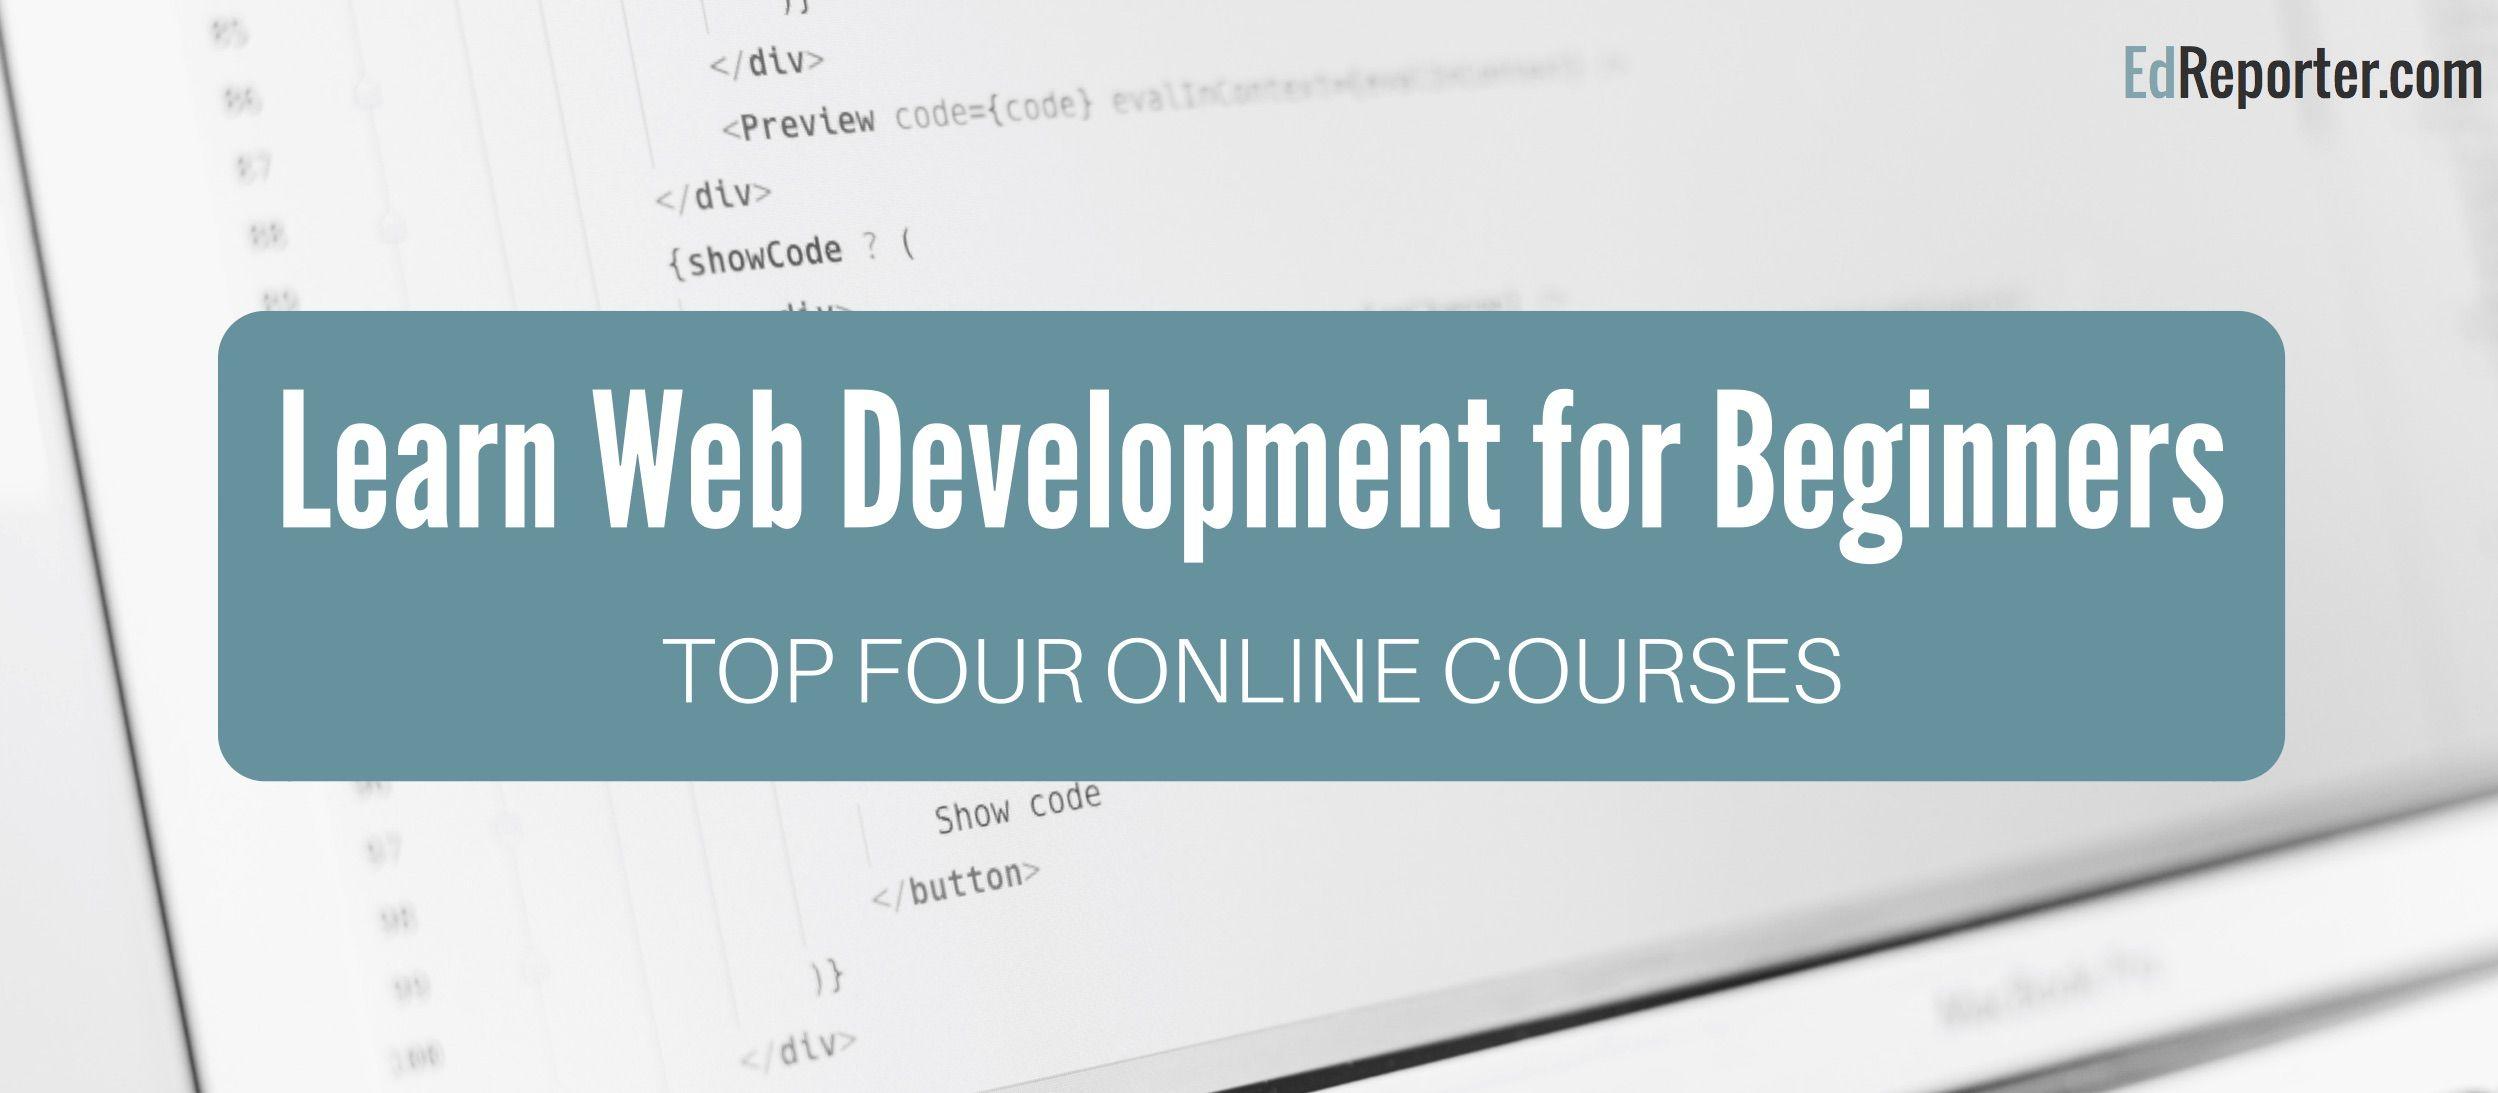 4 Best Online Courses To Learn Web Development For Beginners Learn Web Development Web Development Online Courses